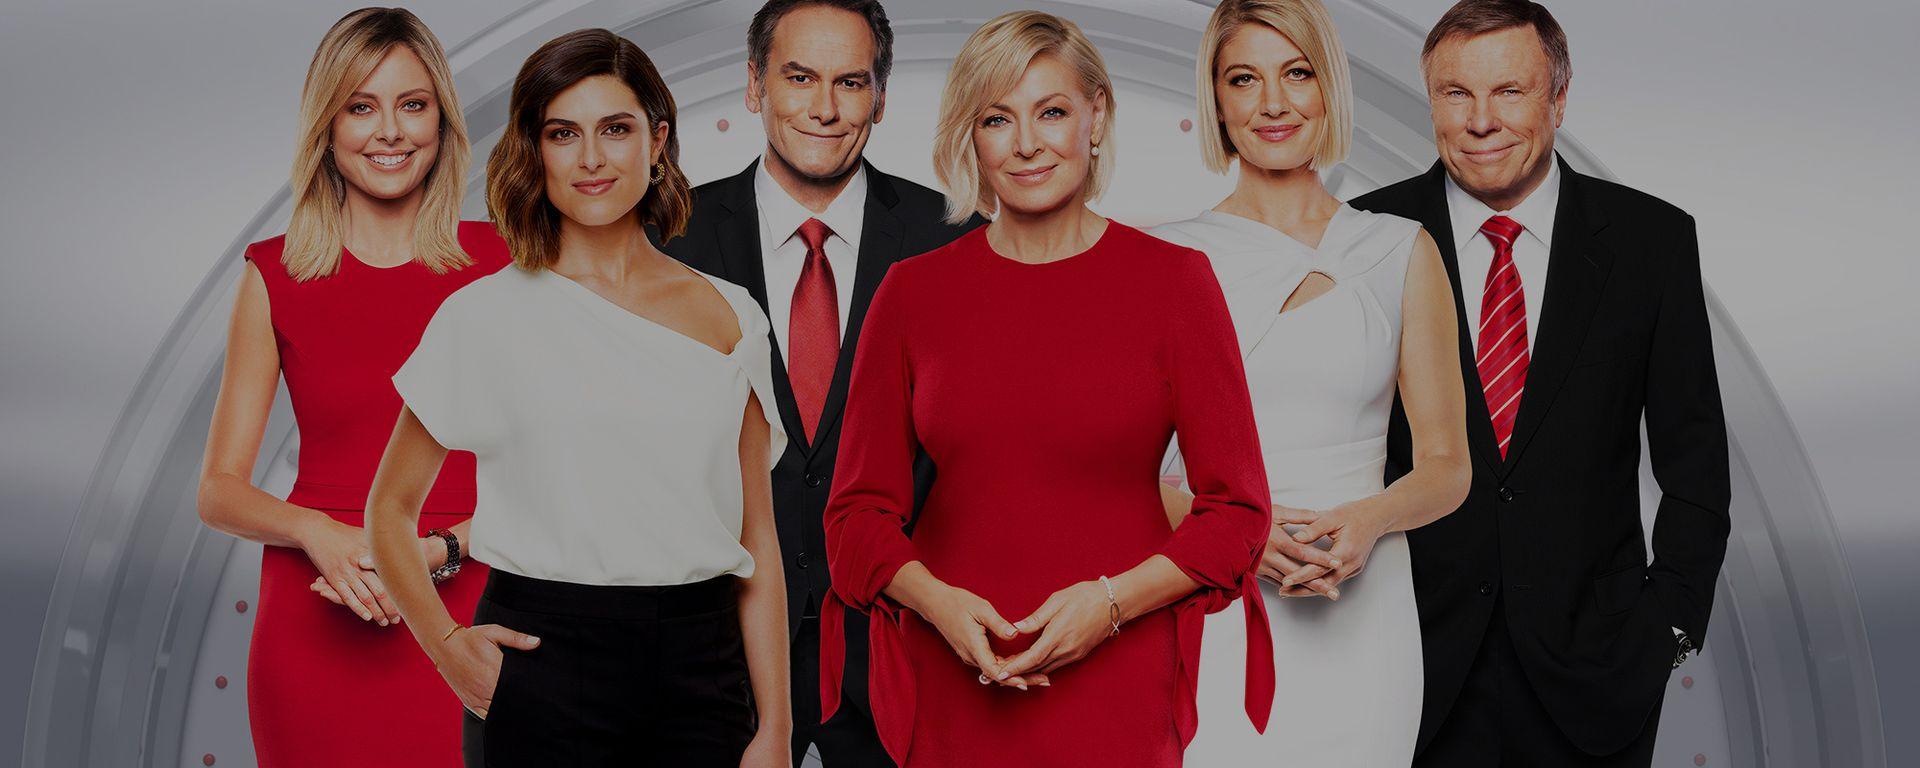 Watch TV Shows: Browse Online Index, Stream On Demand Free